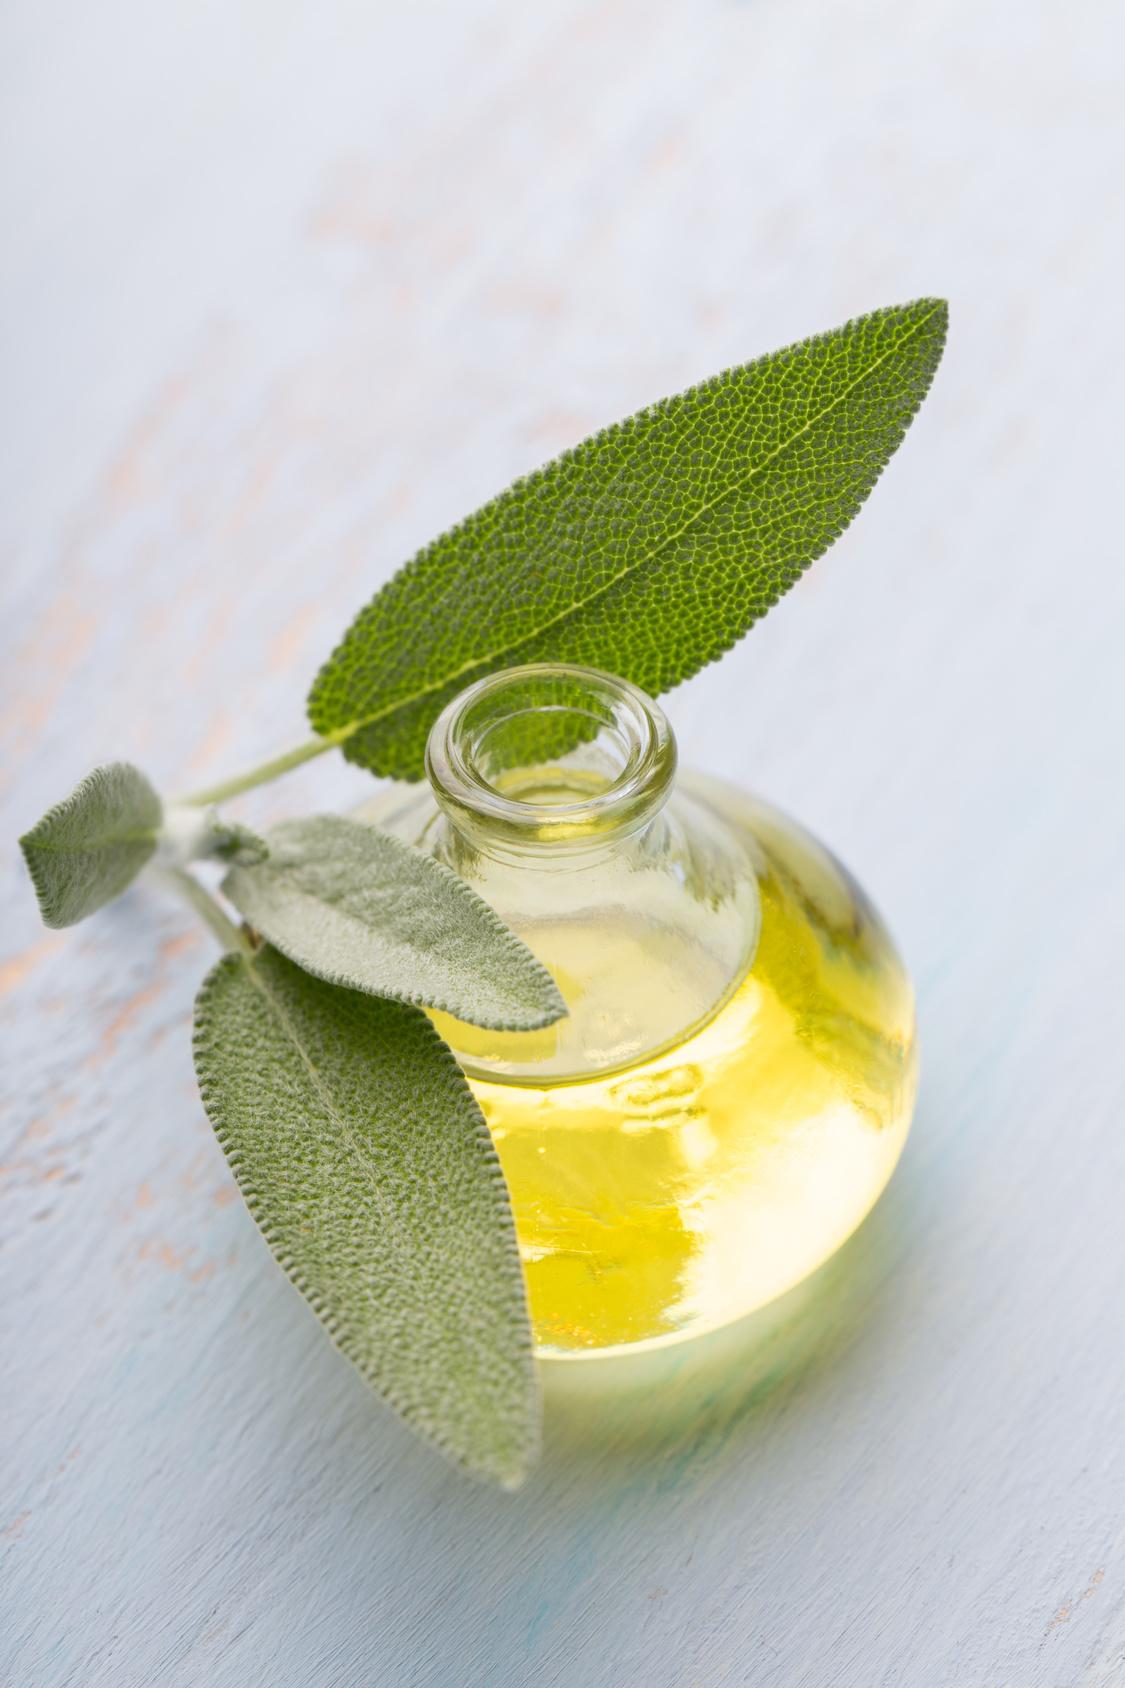 7 nützliche Tipps gegen trockene Haut im Winter